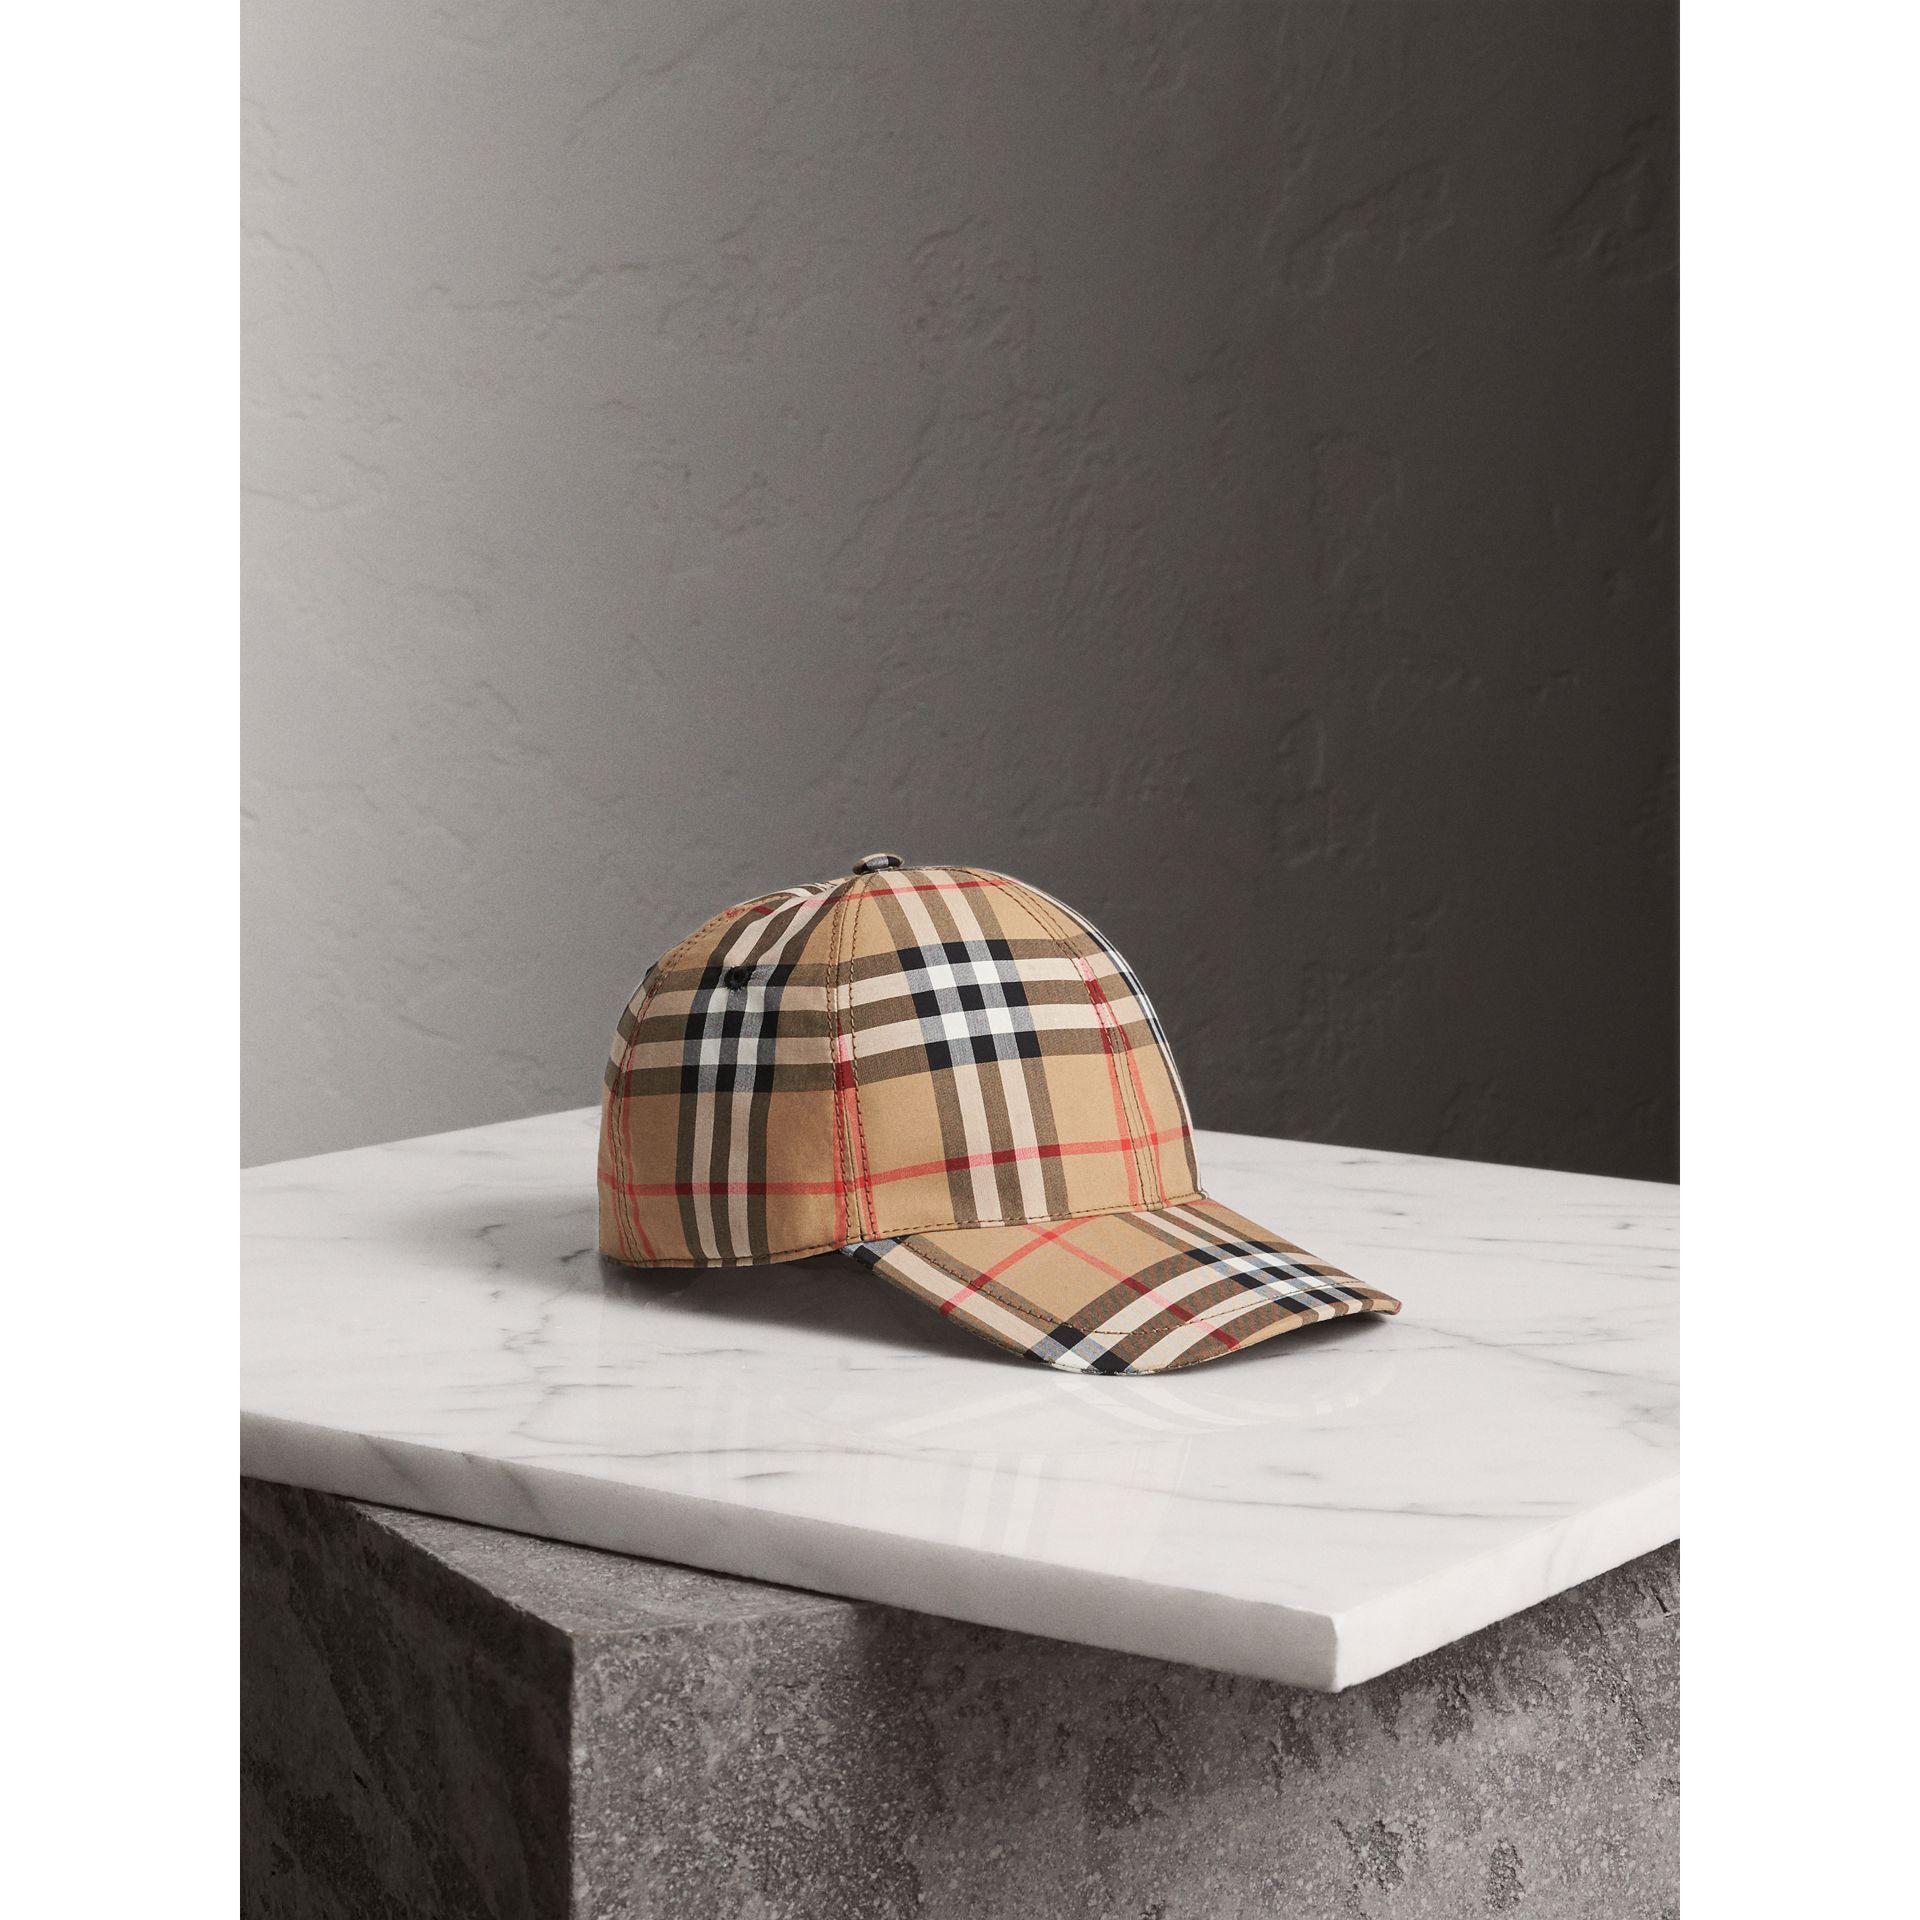 052eece27bdde0 Burberry Vintage Check Baseball Cap - Lyst